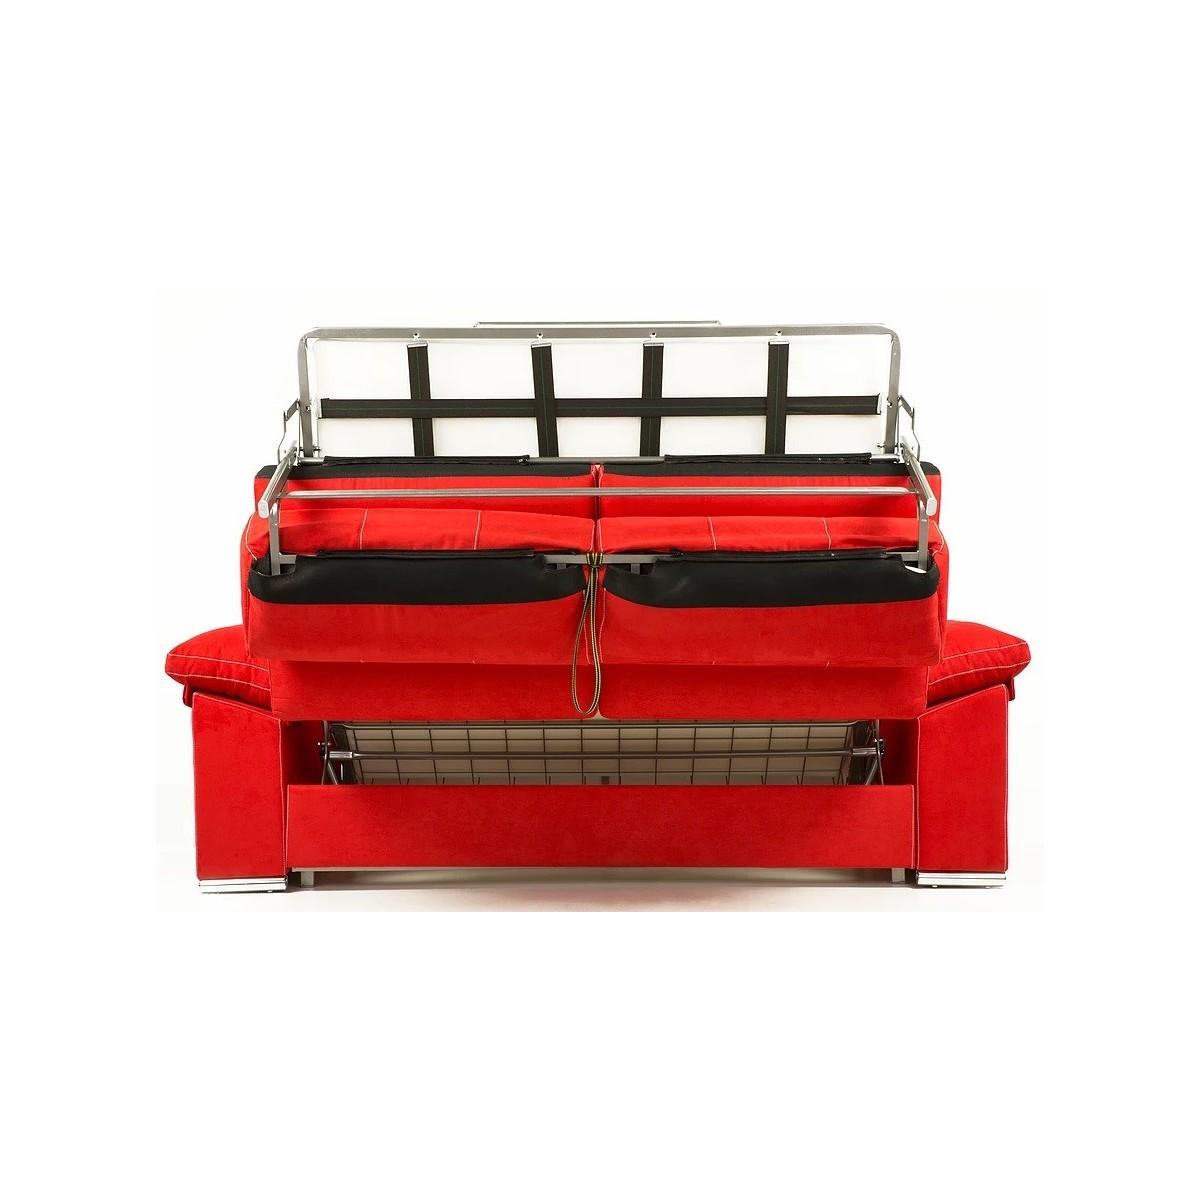 Sof cama sistema italiano modelo venus mubeko for Sofa cama sistema italiano en oferta